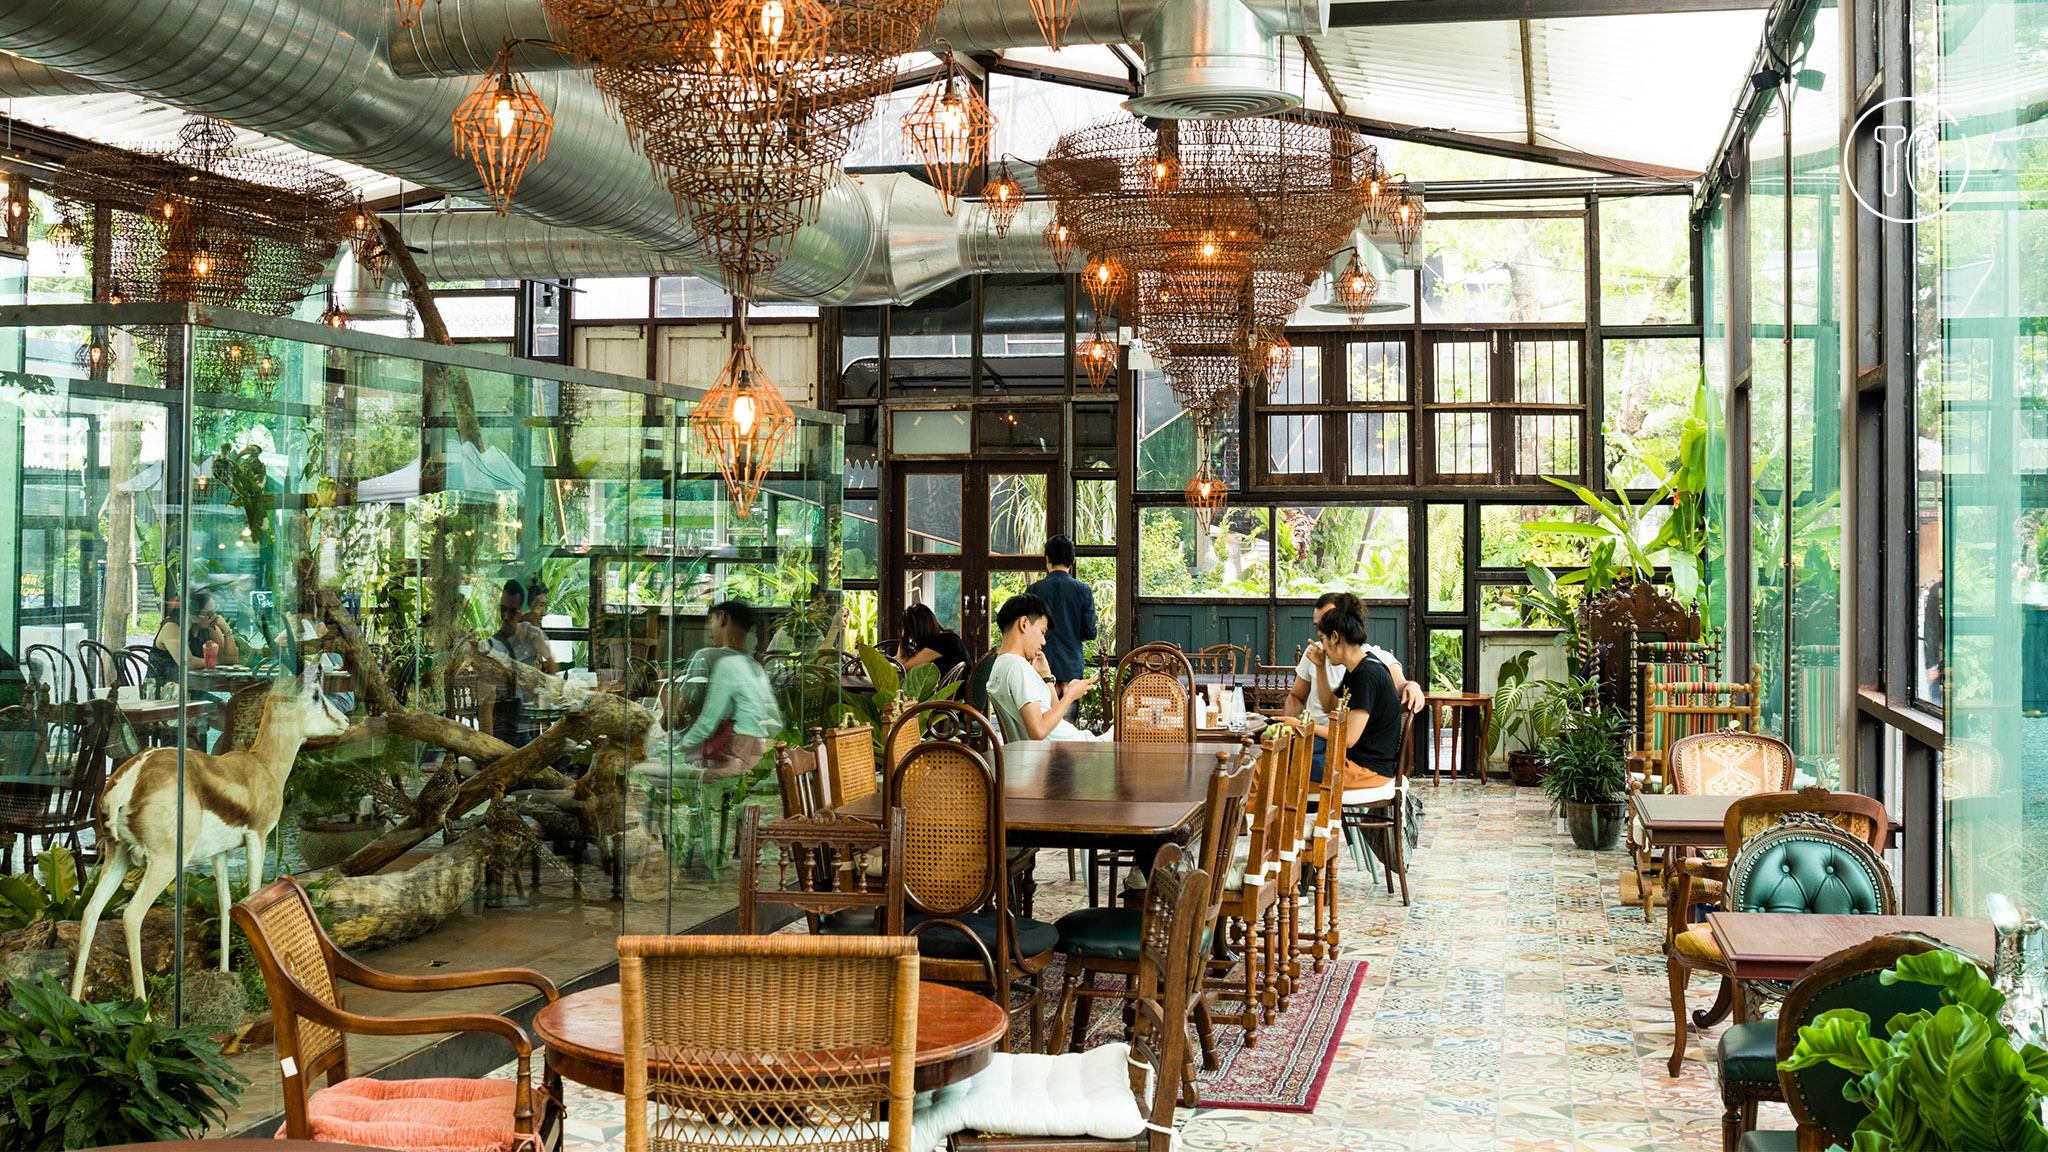 Thé at Chang Chui tea